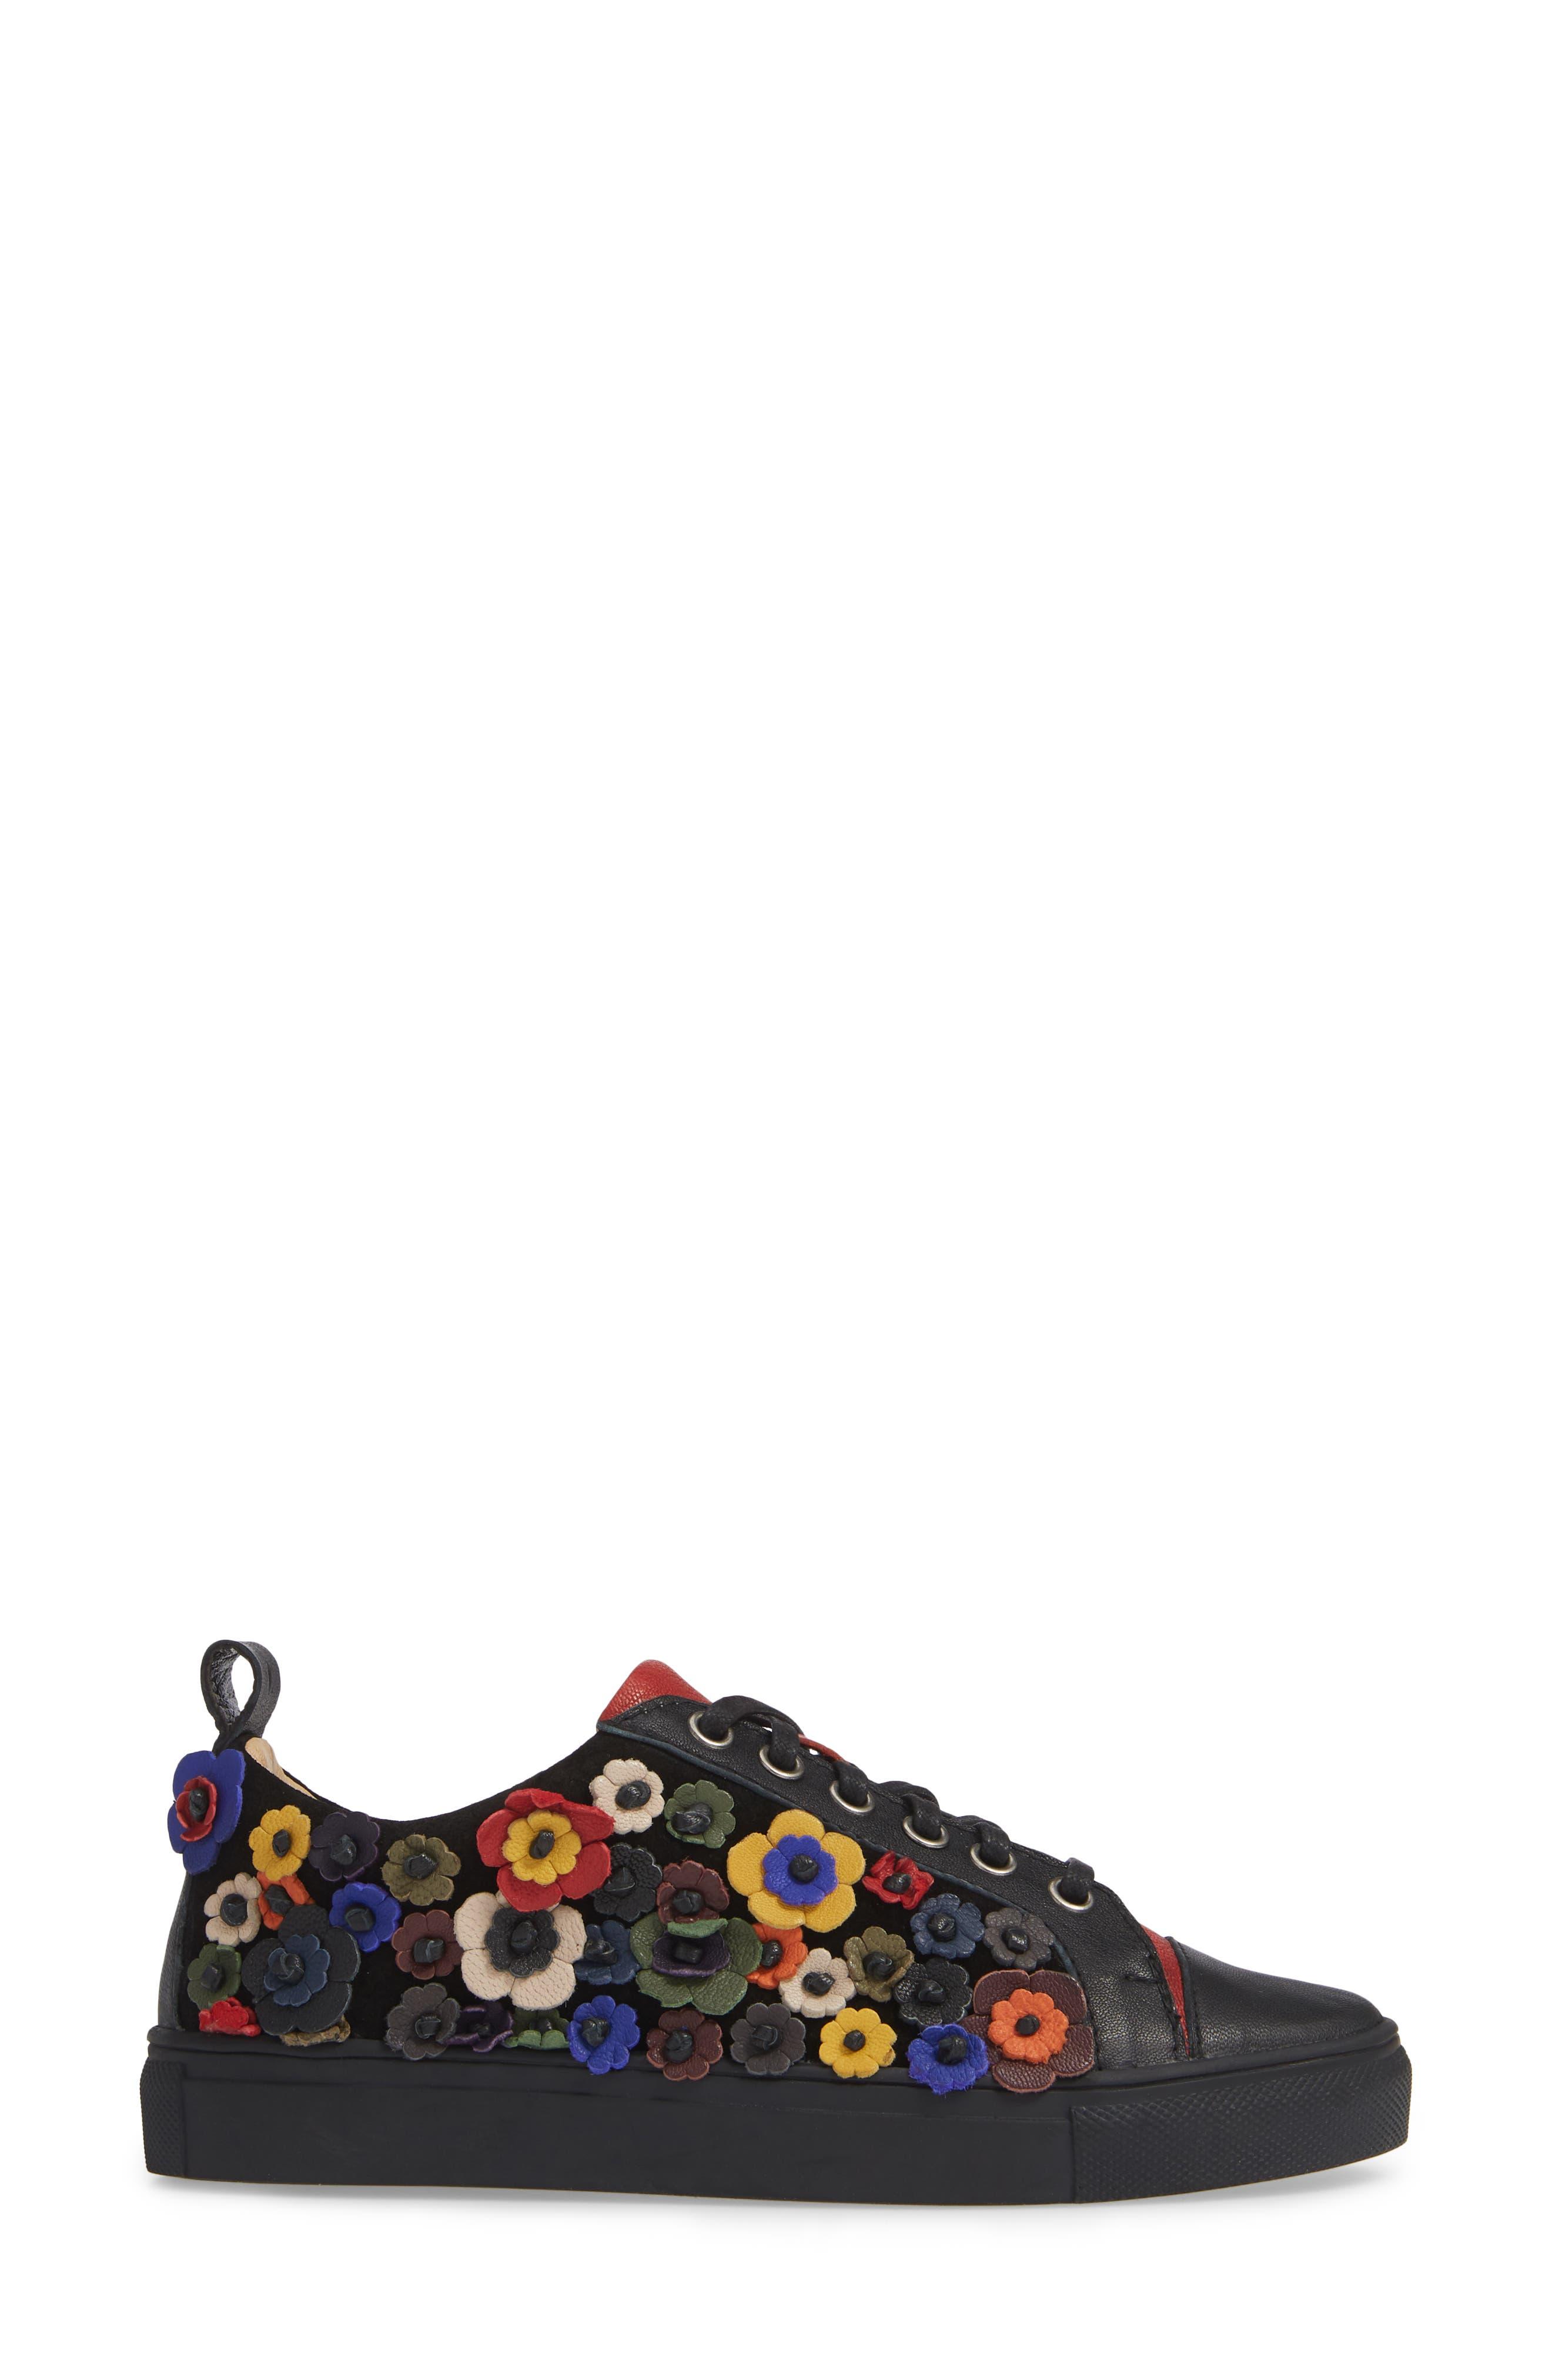 SHERIDAN MIA, Satyr Sneaker, Alternate thumbnail 3, color, BLACK LEATHER